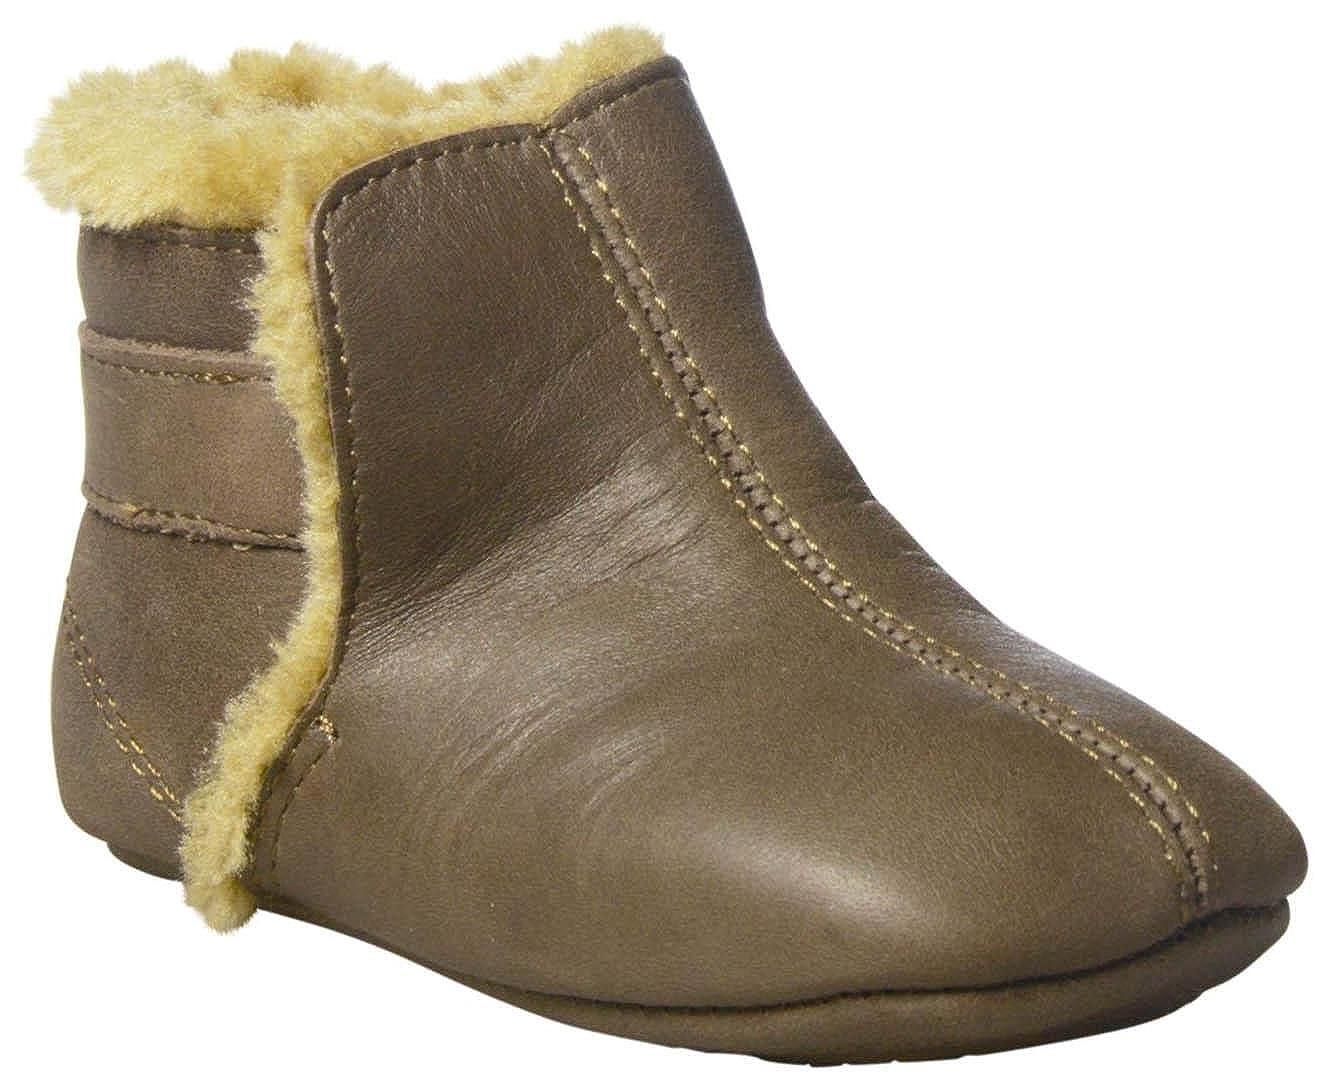 Infant//Toddler Old Soles Kids Polar Boot